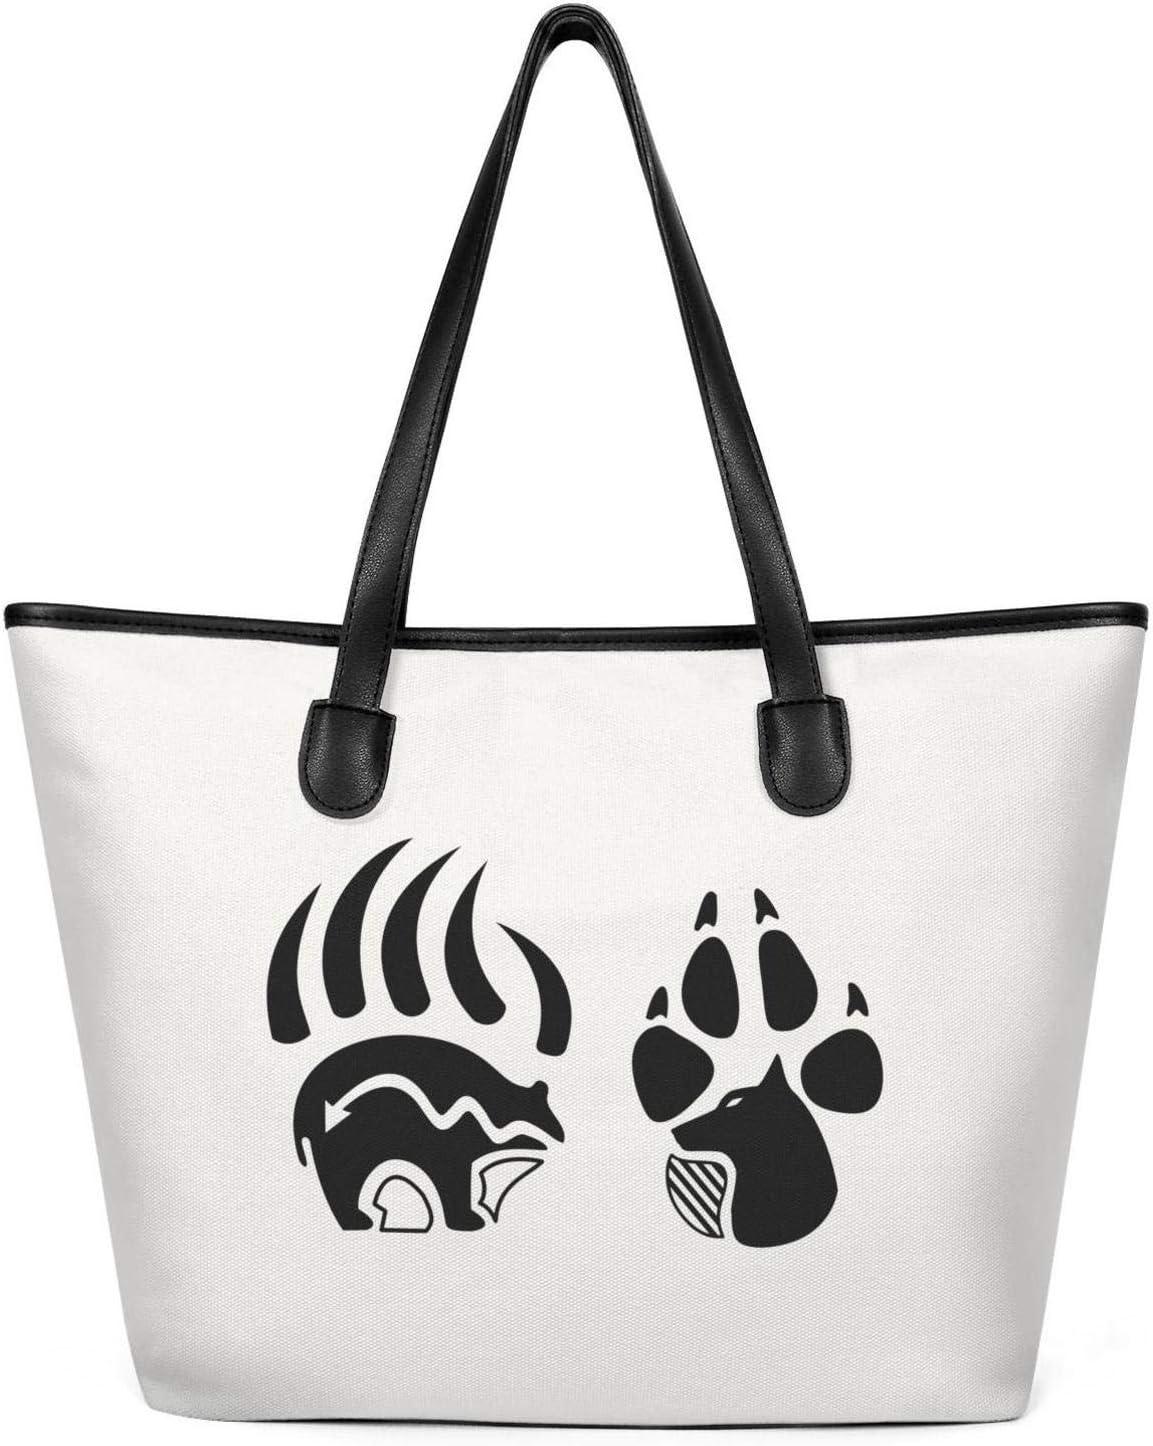 Flamingo and Pineapple Fashion Womens Multi-Pocket Vintage Canvas Handbags Miniature Shoulder Bags Totes Purses Shopping Bags